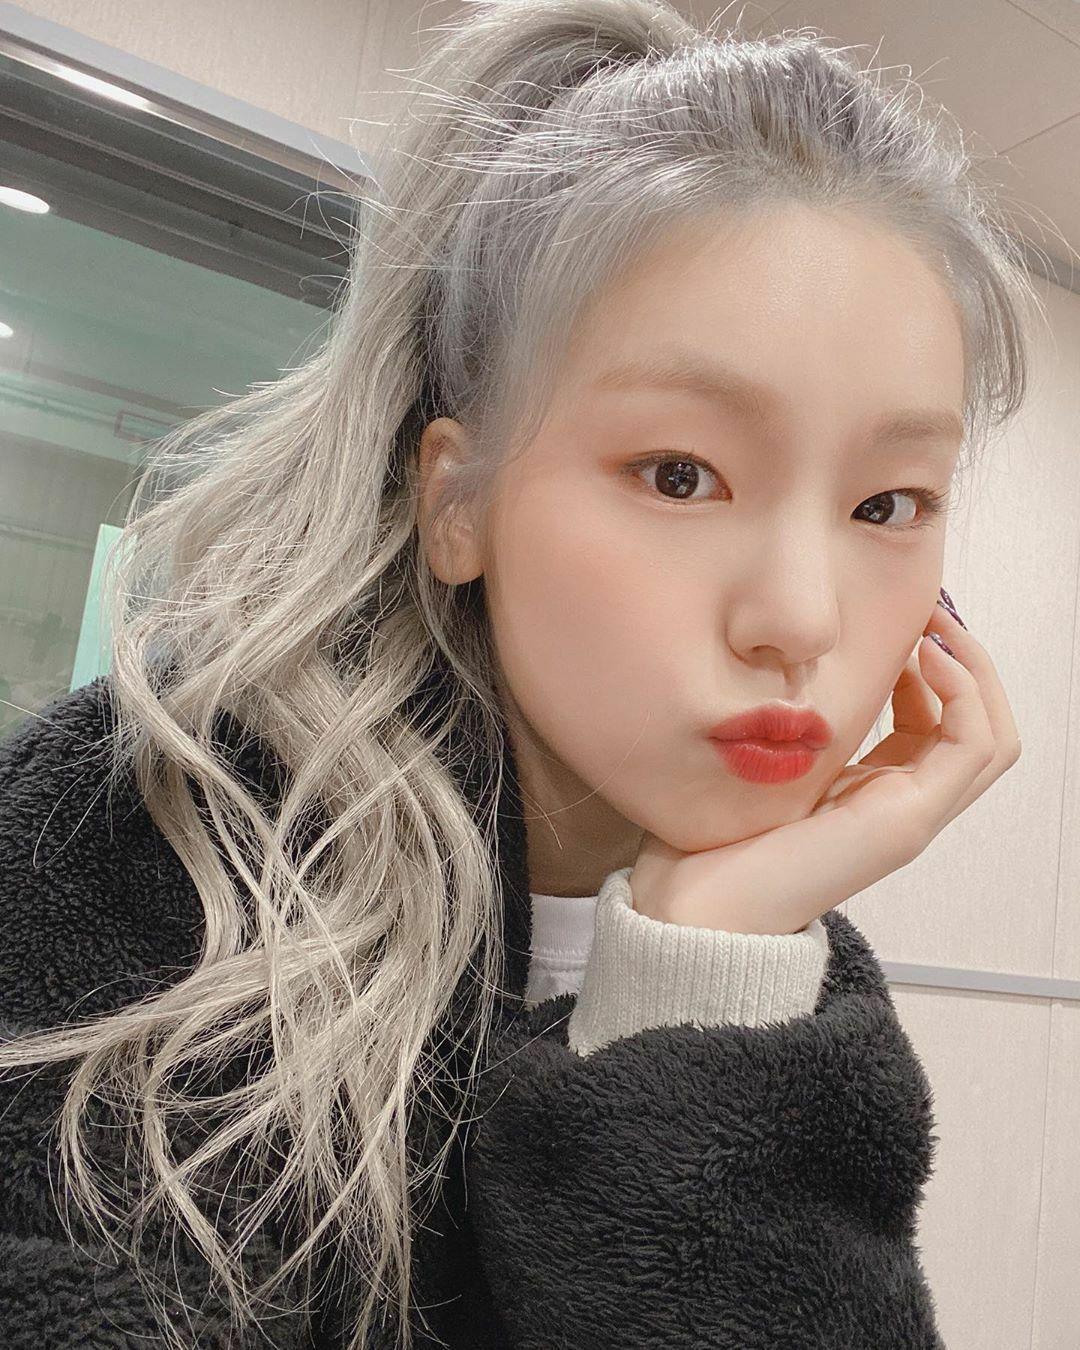 Girl Kpop Idols Aesthetic Girl Kpop Idols Kpop Meninas Coreanas Coreana